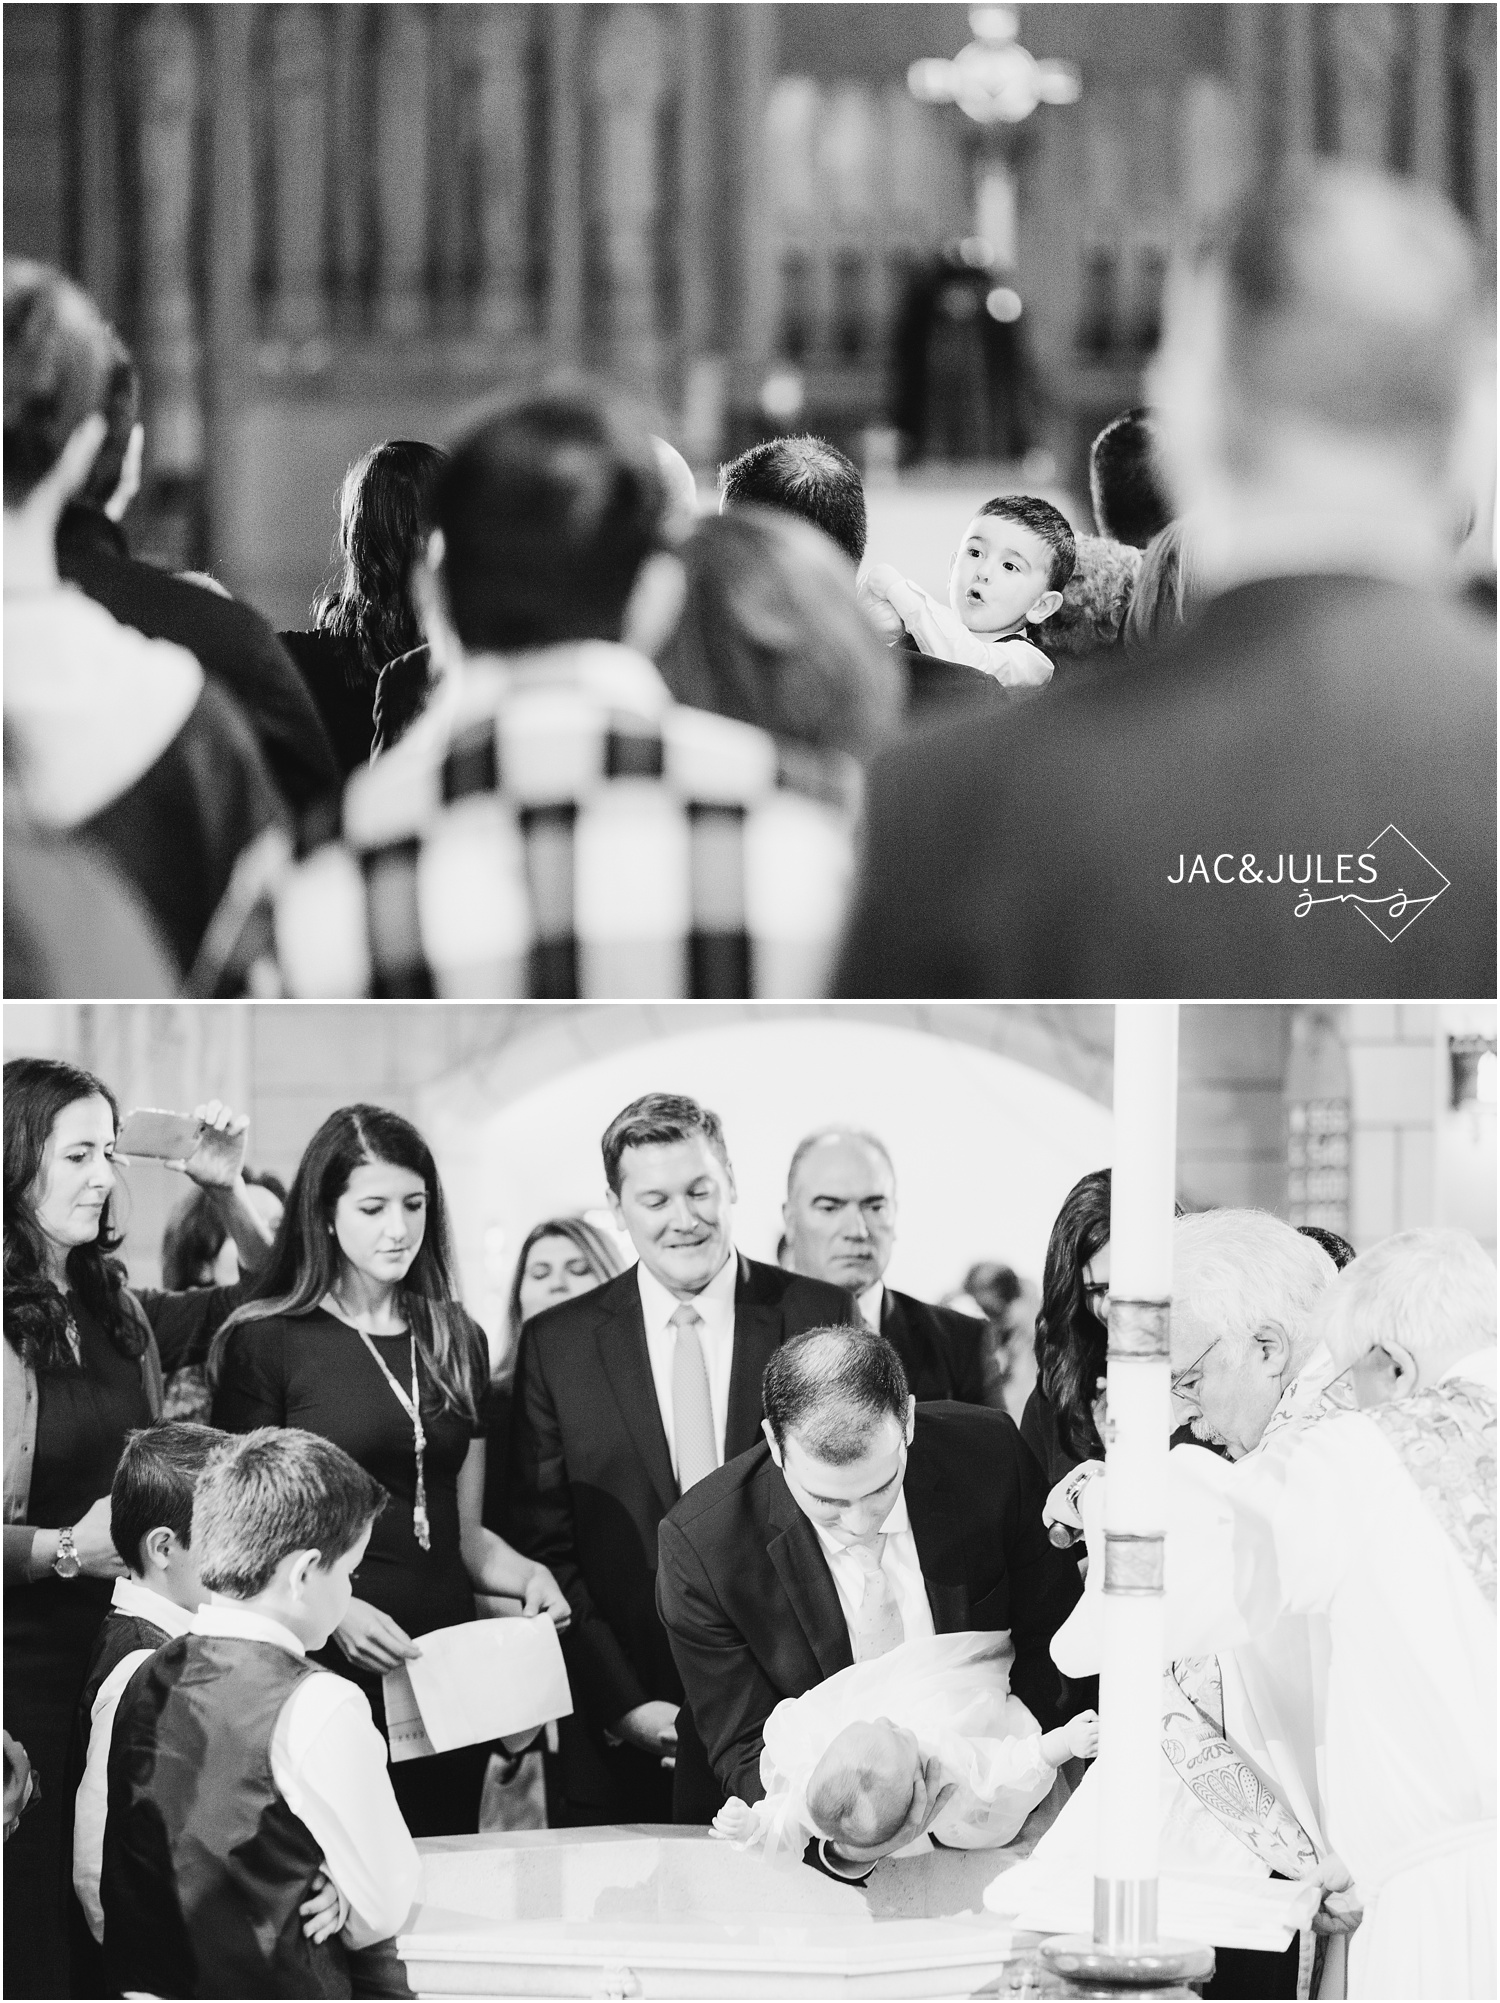 Baptism at St. Stephen's Church in Kearny, NJ.